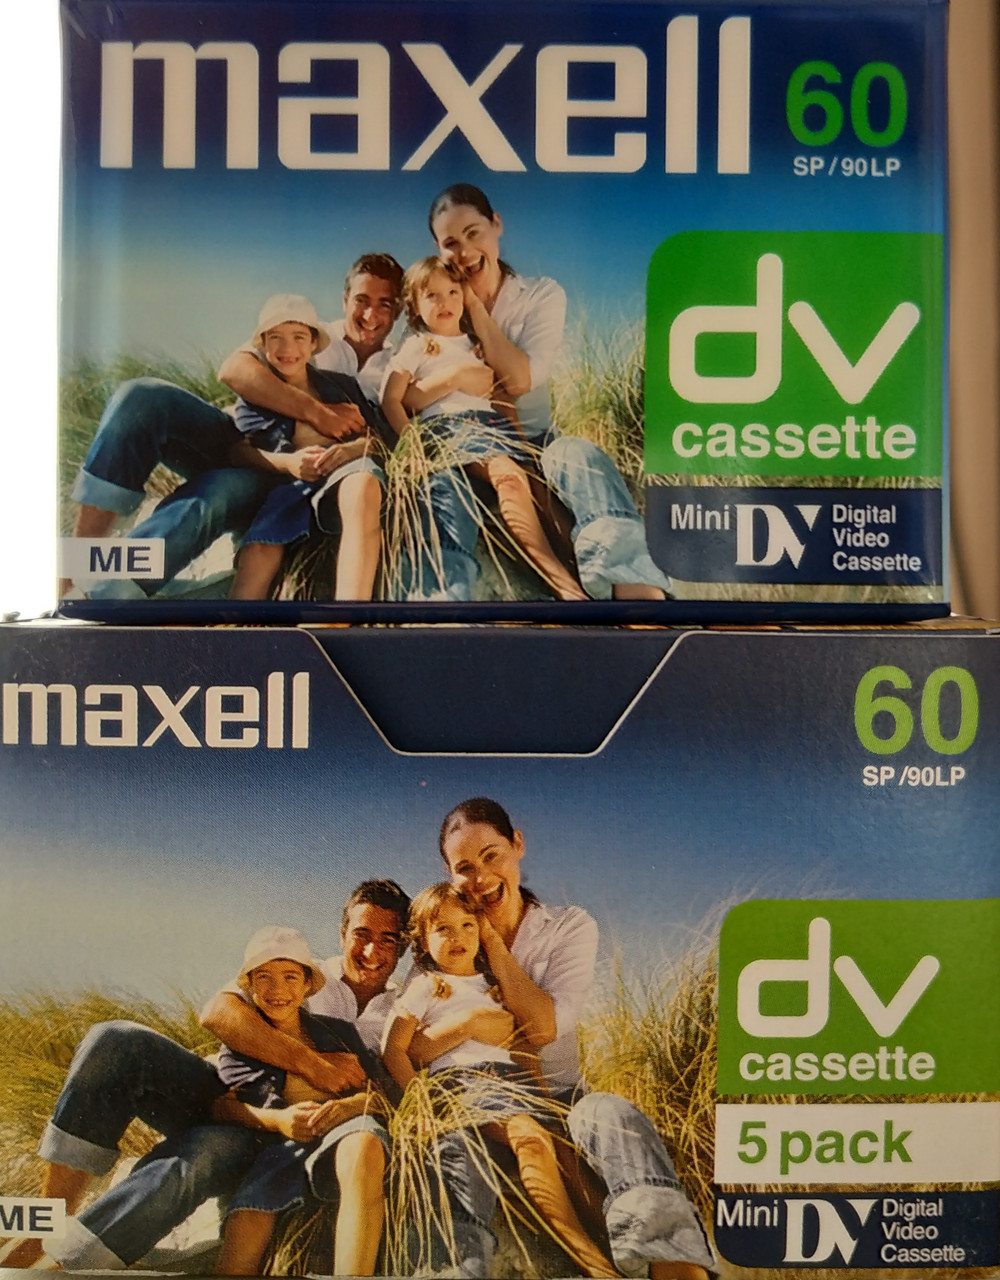 Видеокассета Maxell mdv 60